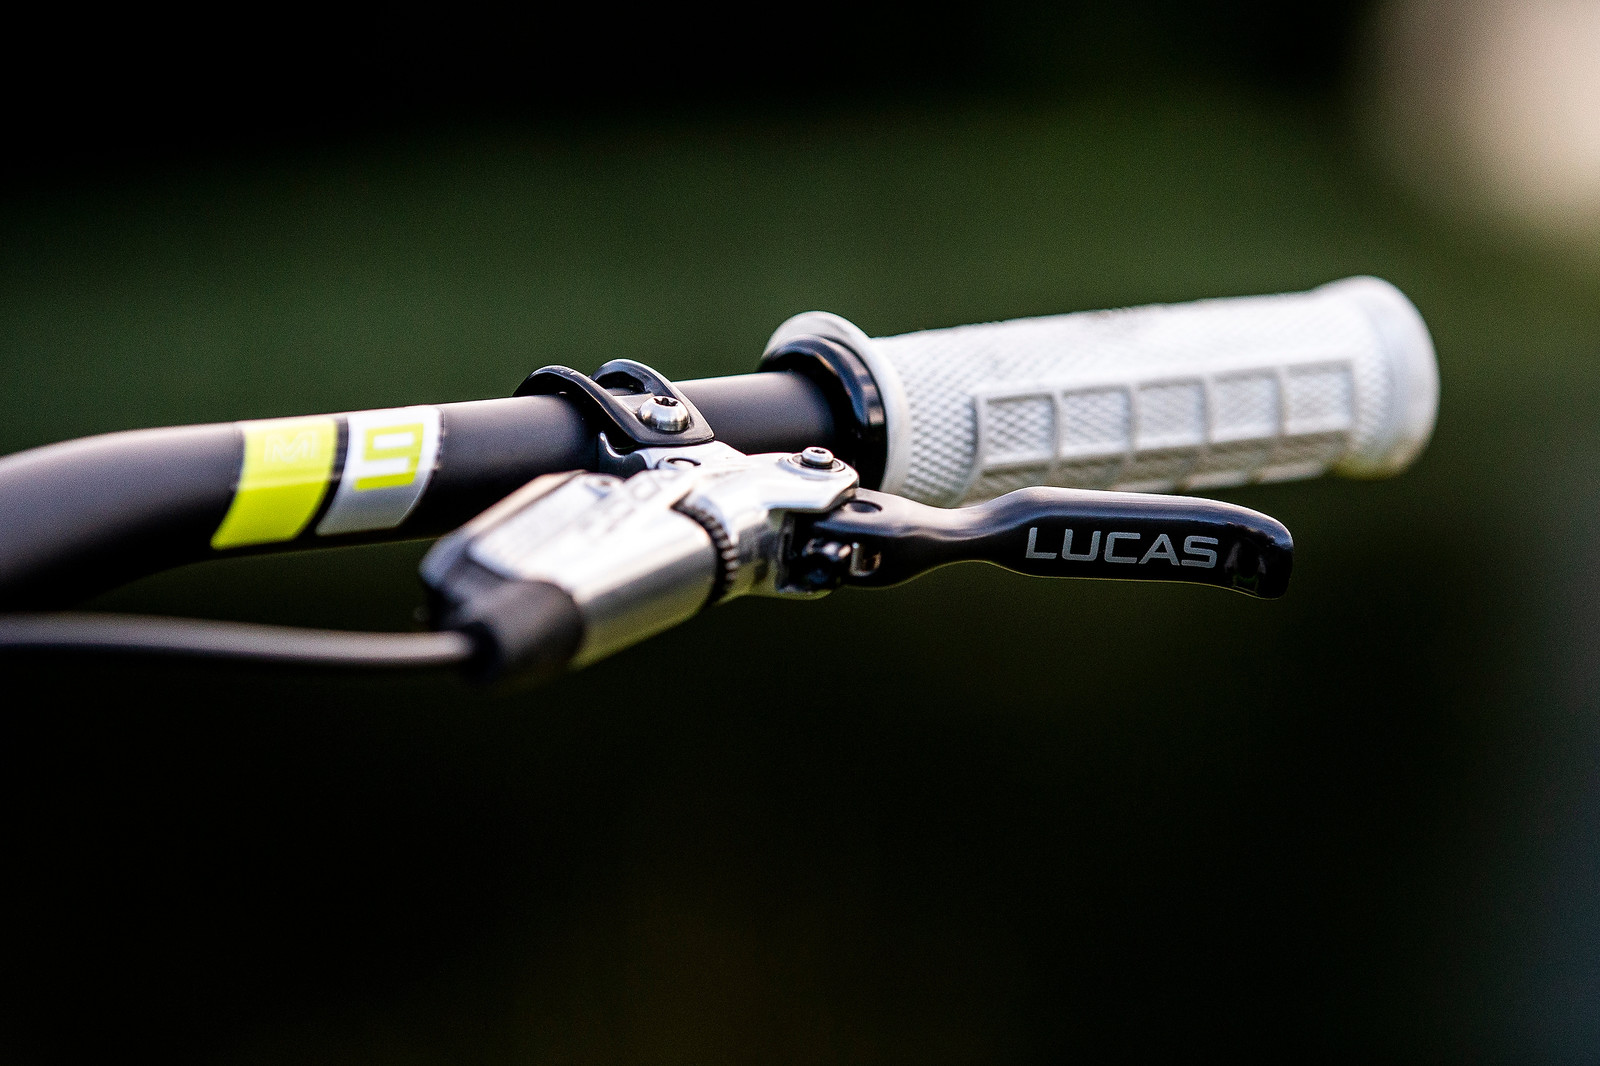 Cockpit - WORLD CHAMPS BIKE - Dean Lucas' Intense M29 - Mountain Biking Pictures - Vital MTB